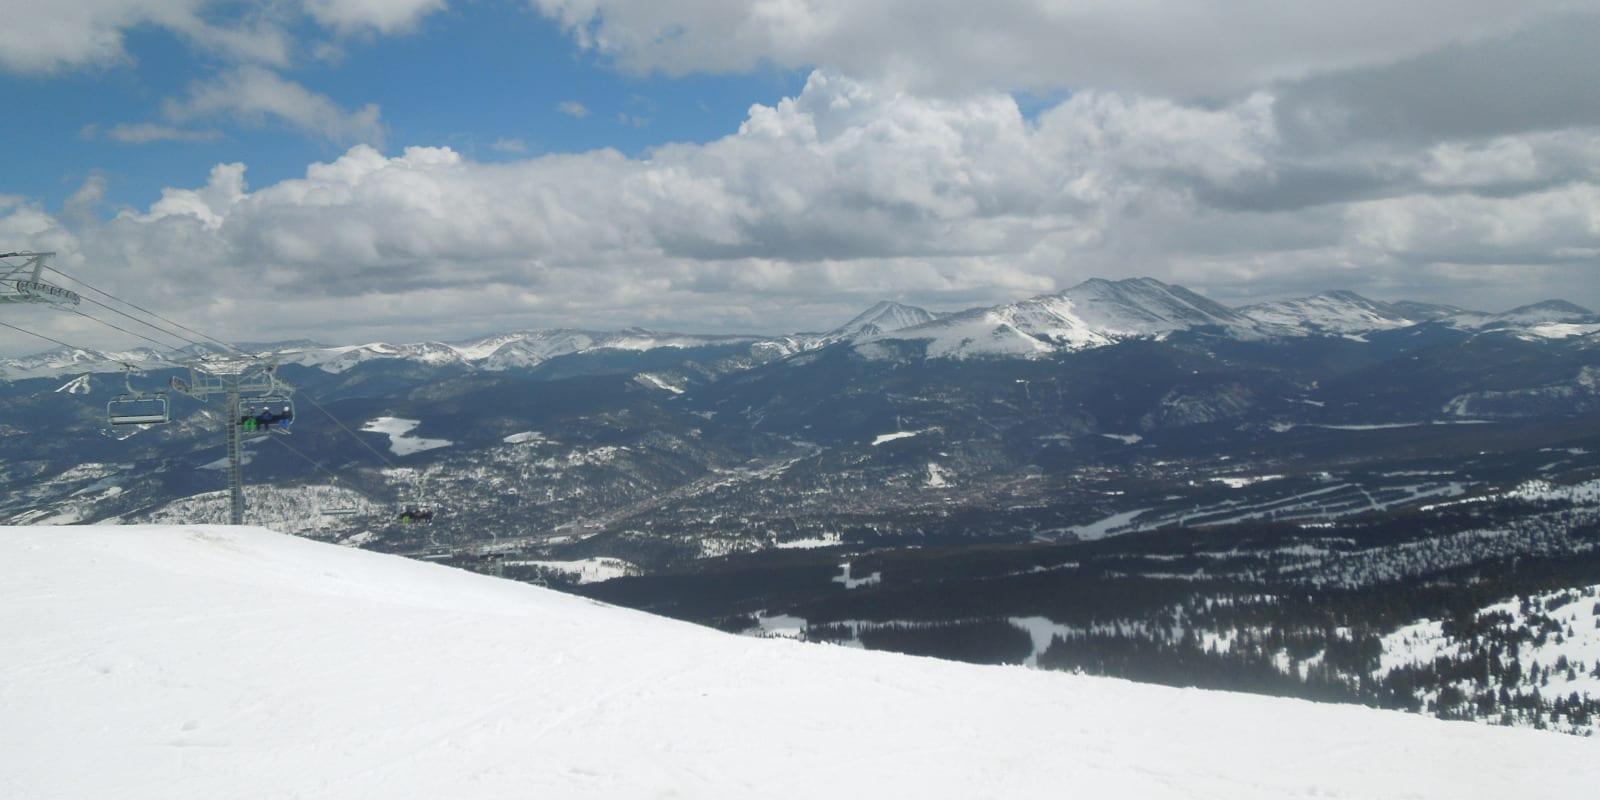 Breckenridge Town Aerial View from Peak 6 Ski Resort